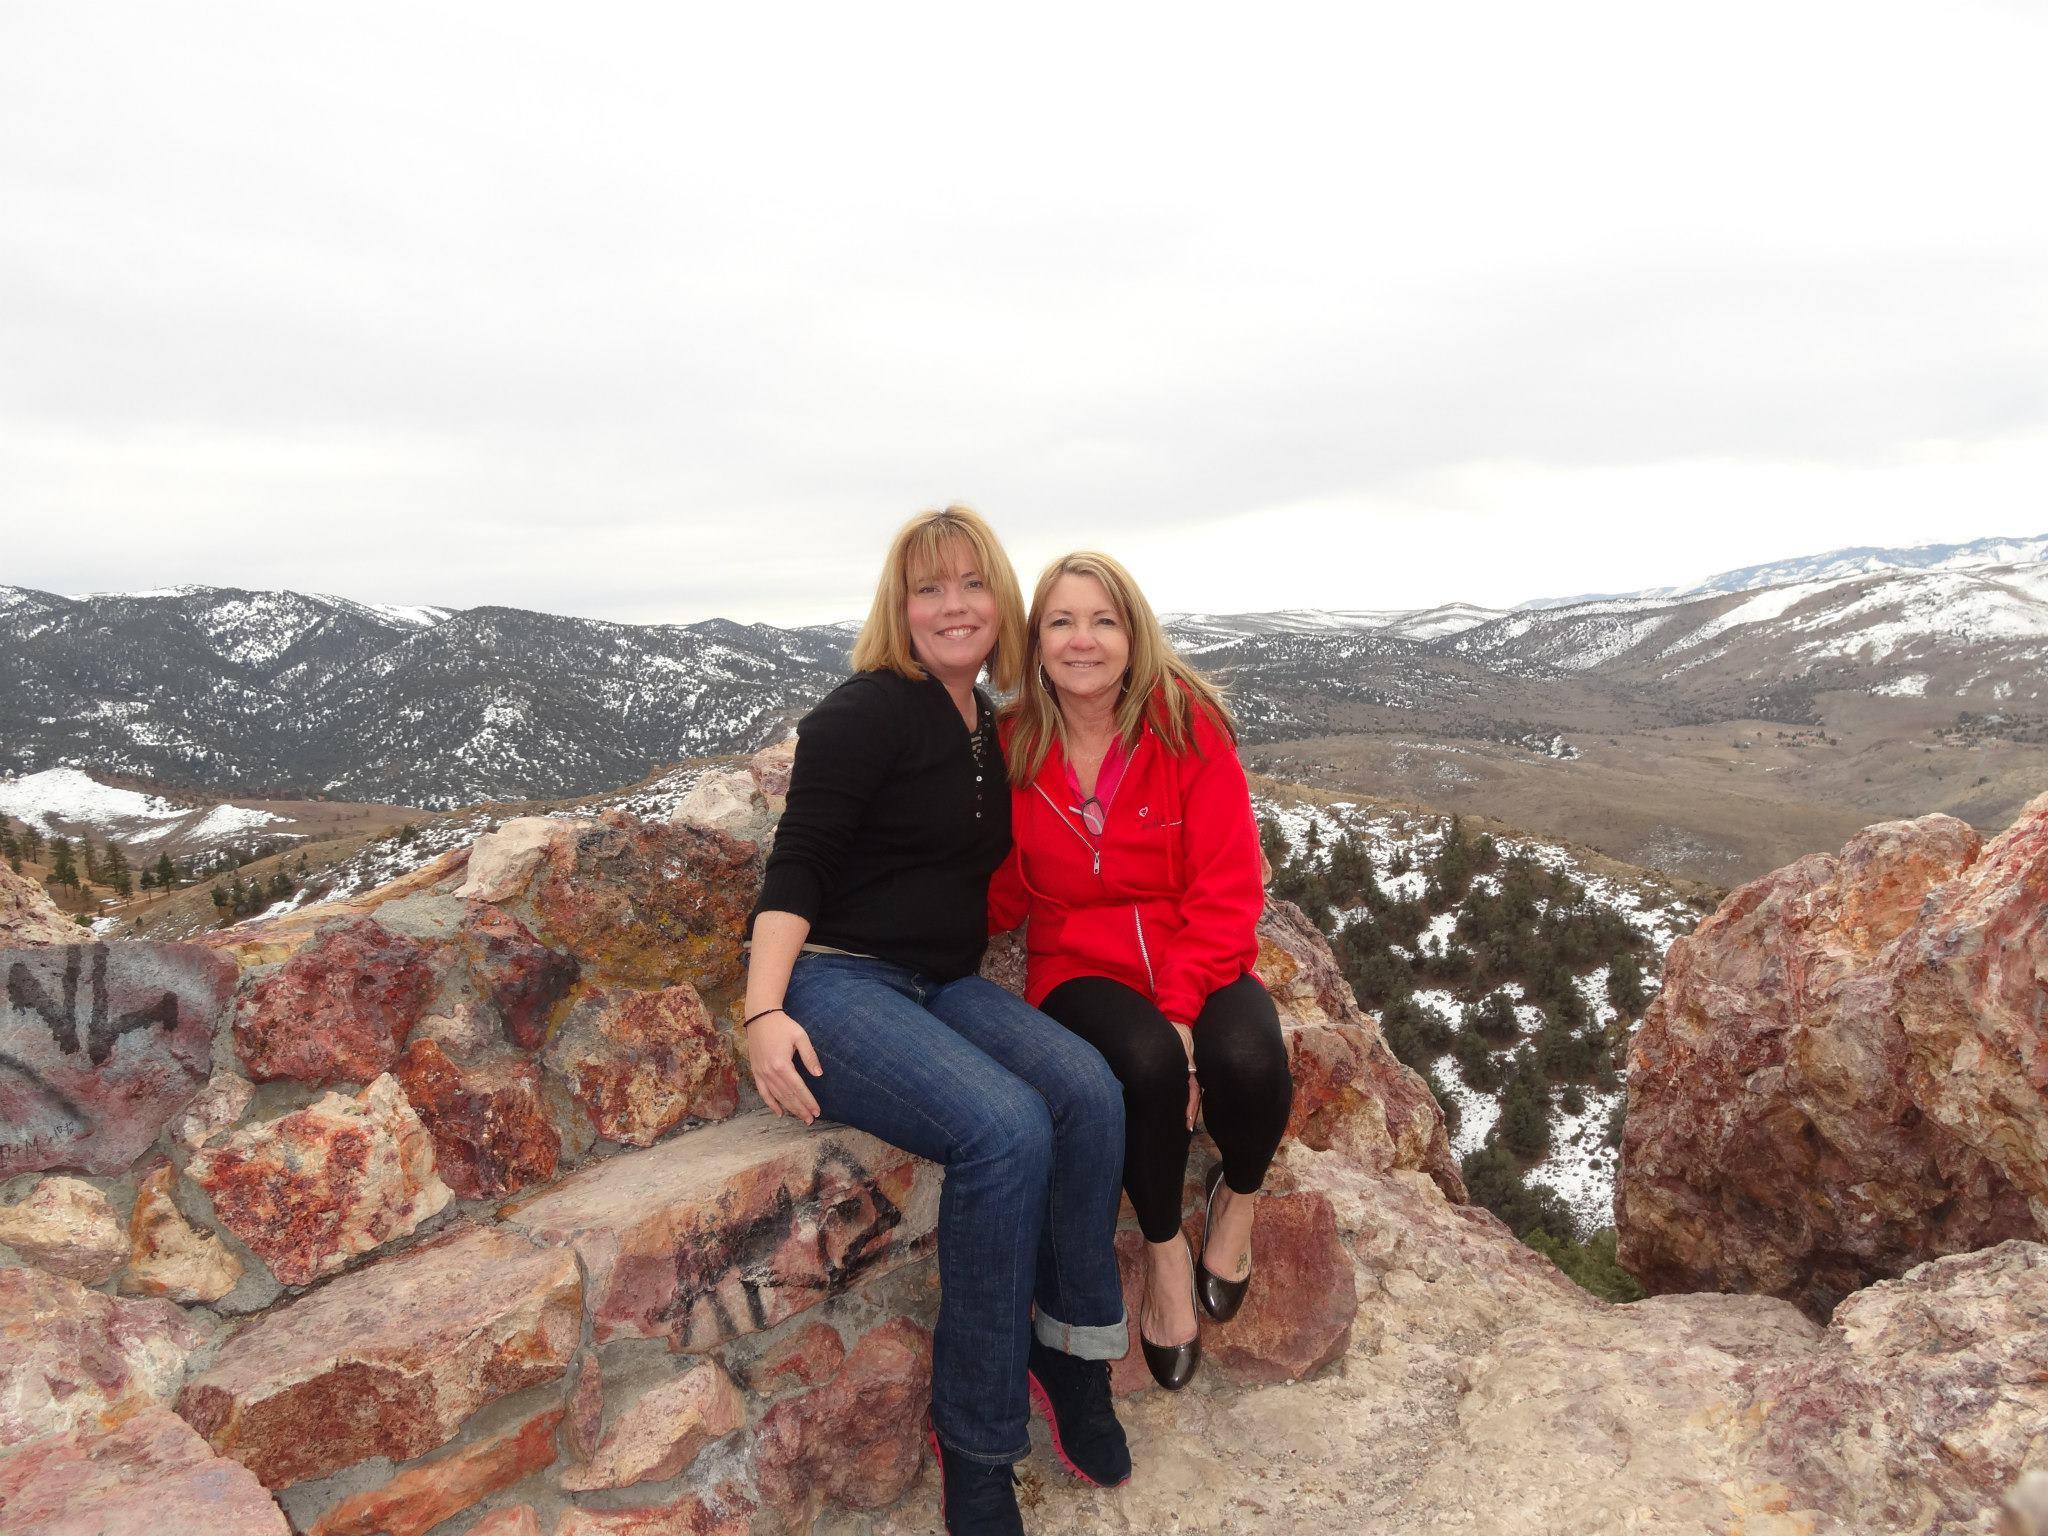 Mountain view in Reno